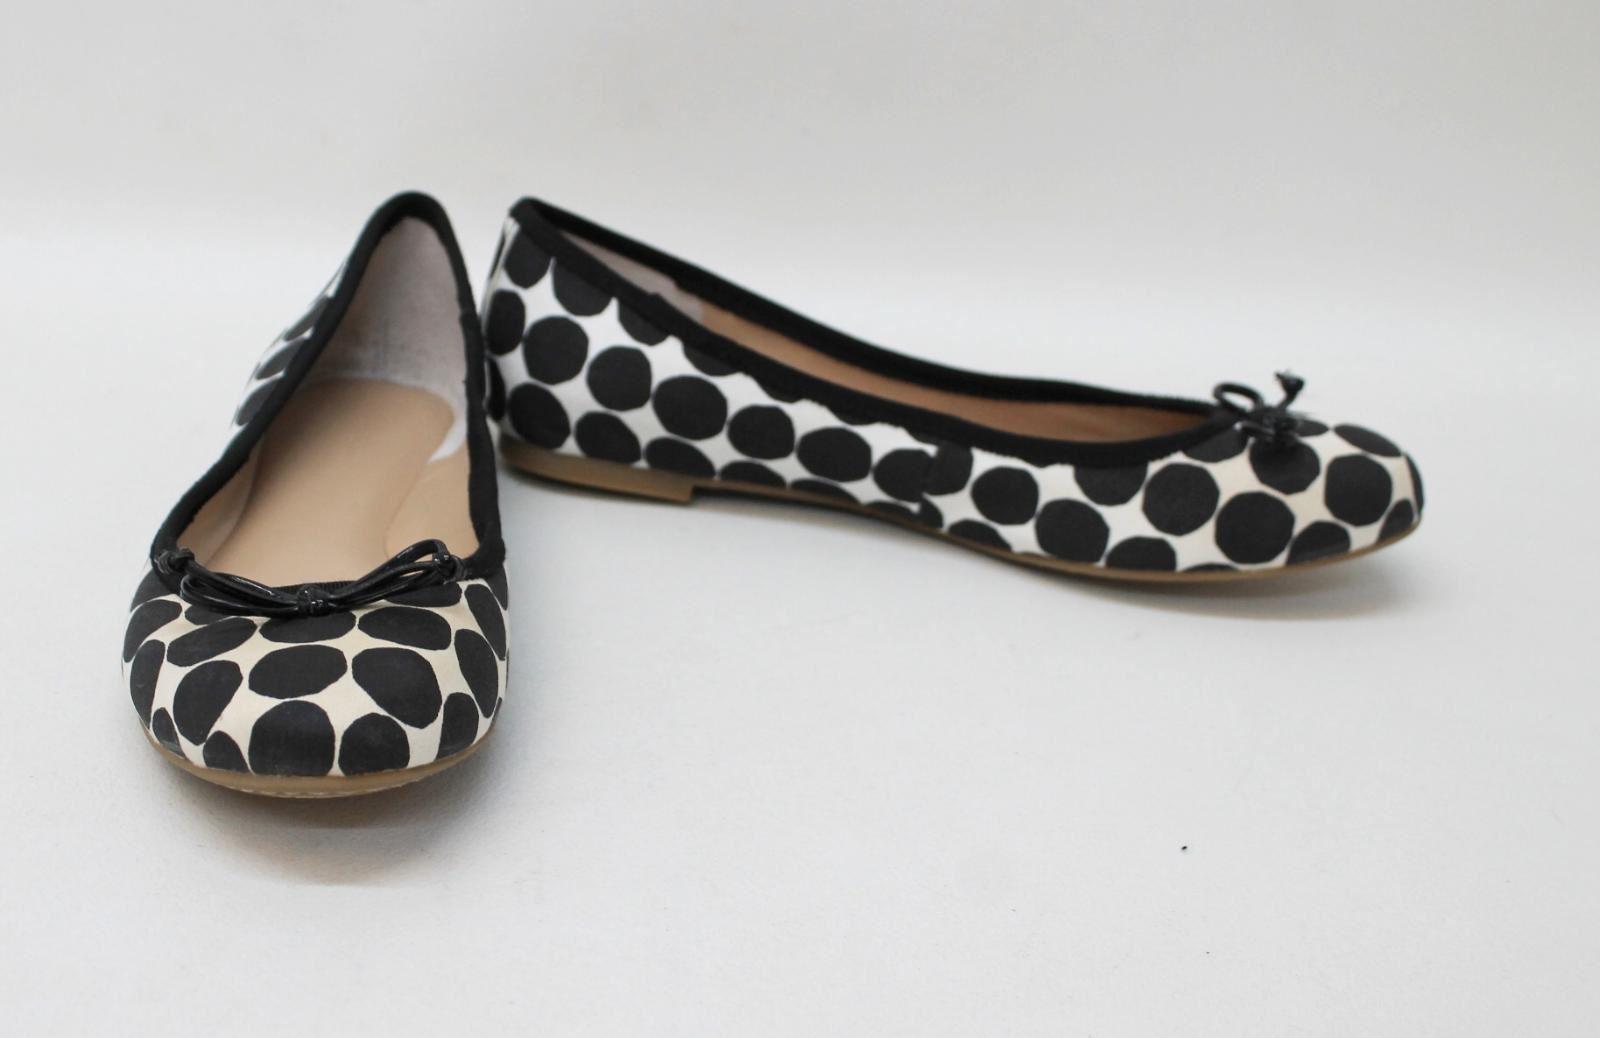 NWOT-BANANA-REPUBLIC-Ladies-Black-Beige-Polka-Dot-Ballerina-Shoes-EU38-UK5